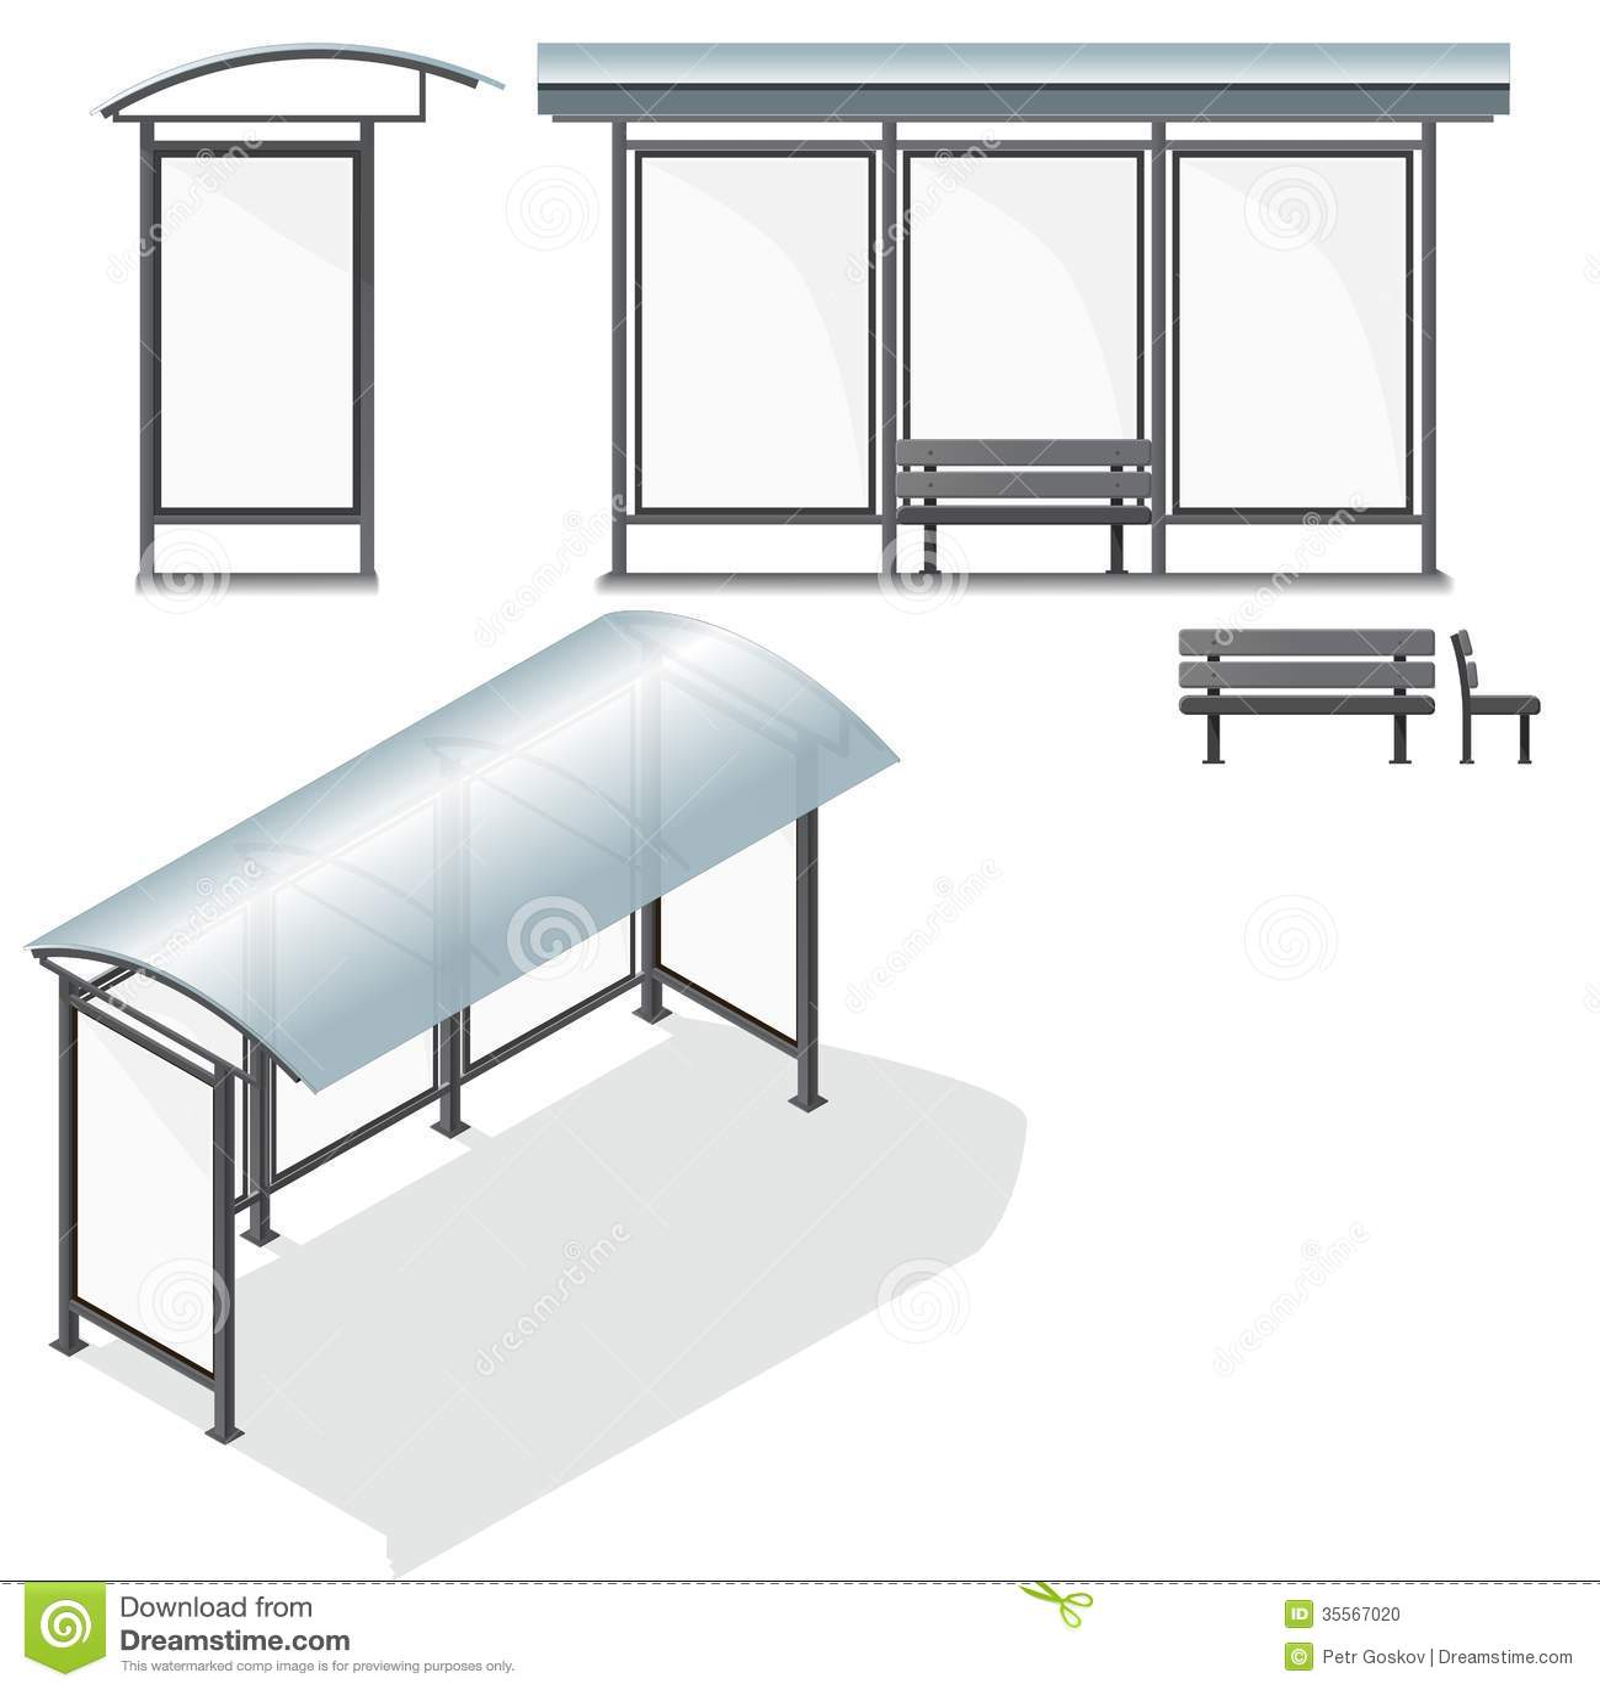 bus stop empty design template for branding stock photo